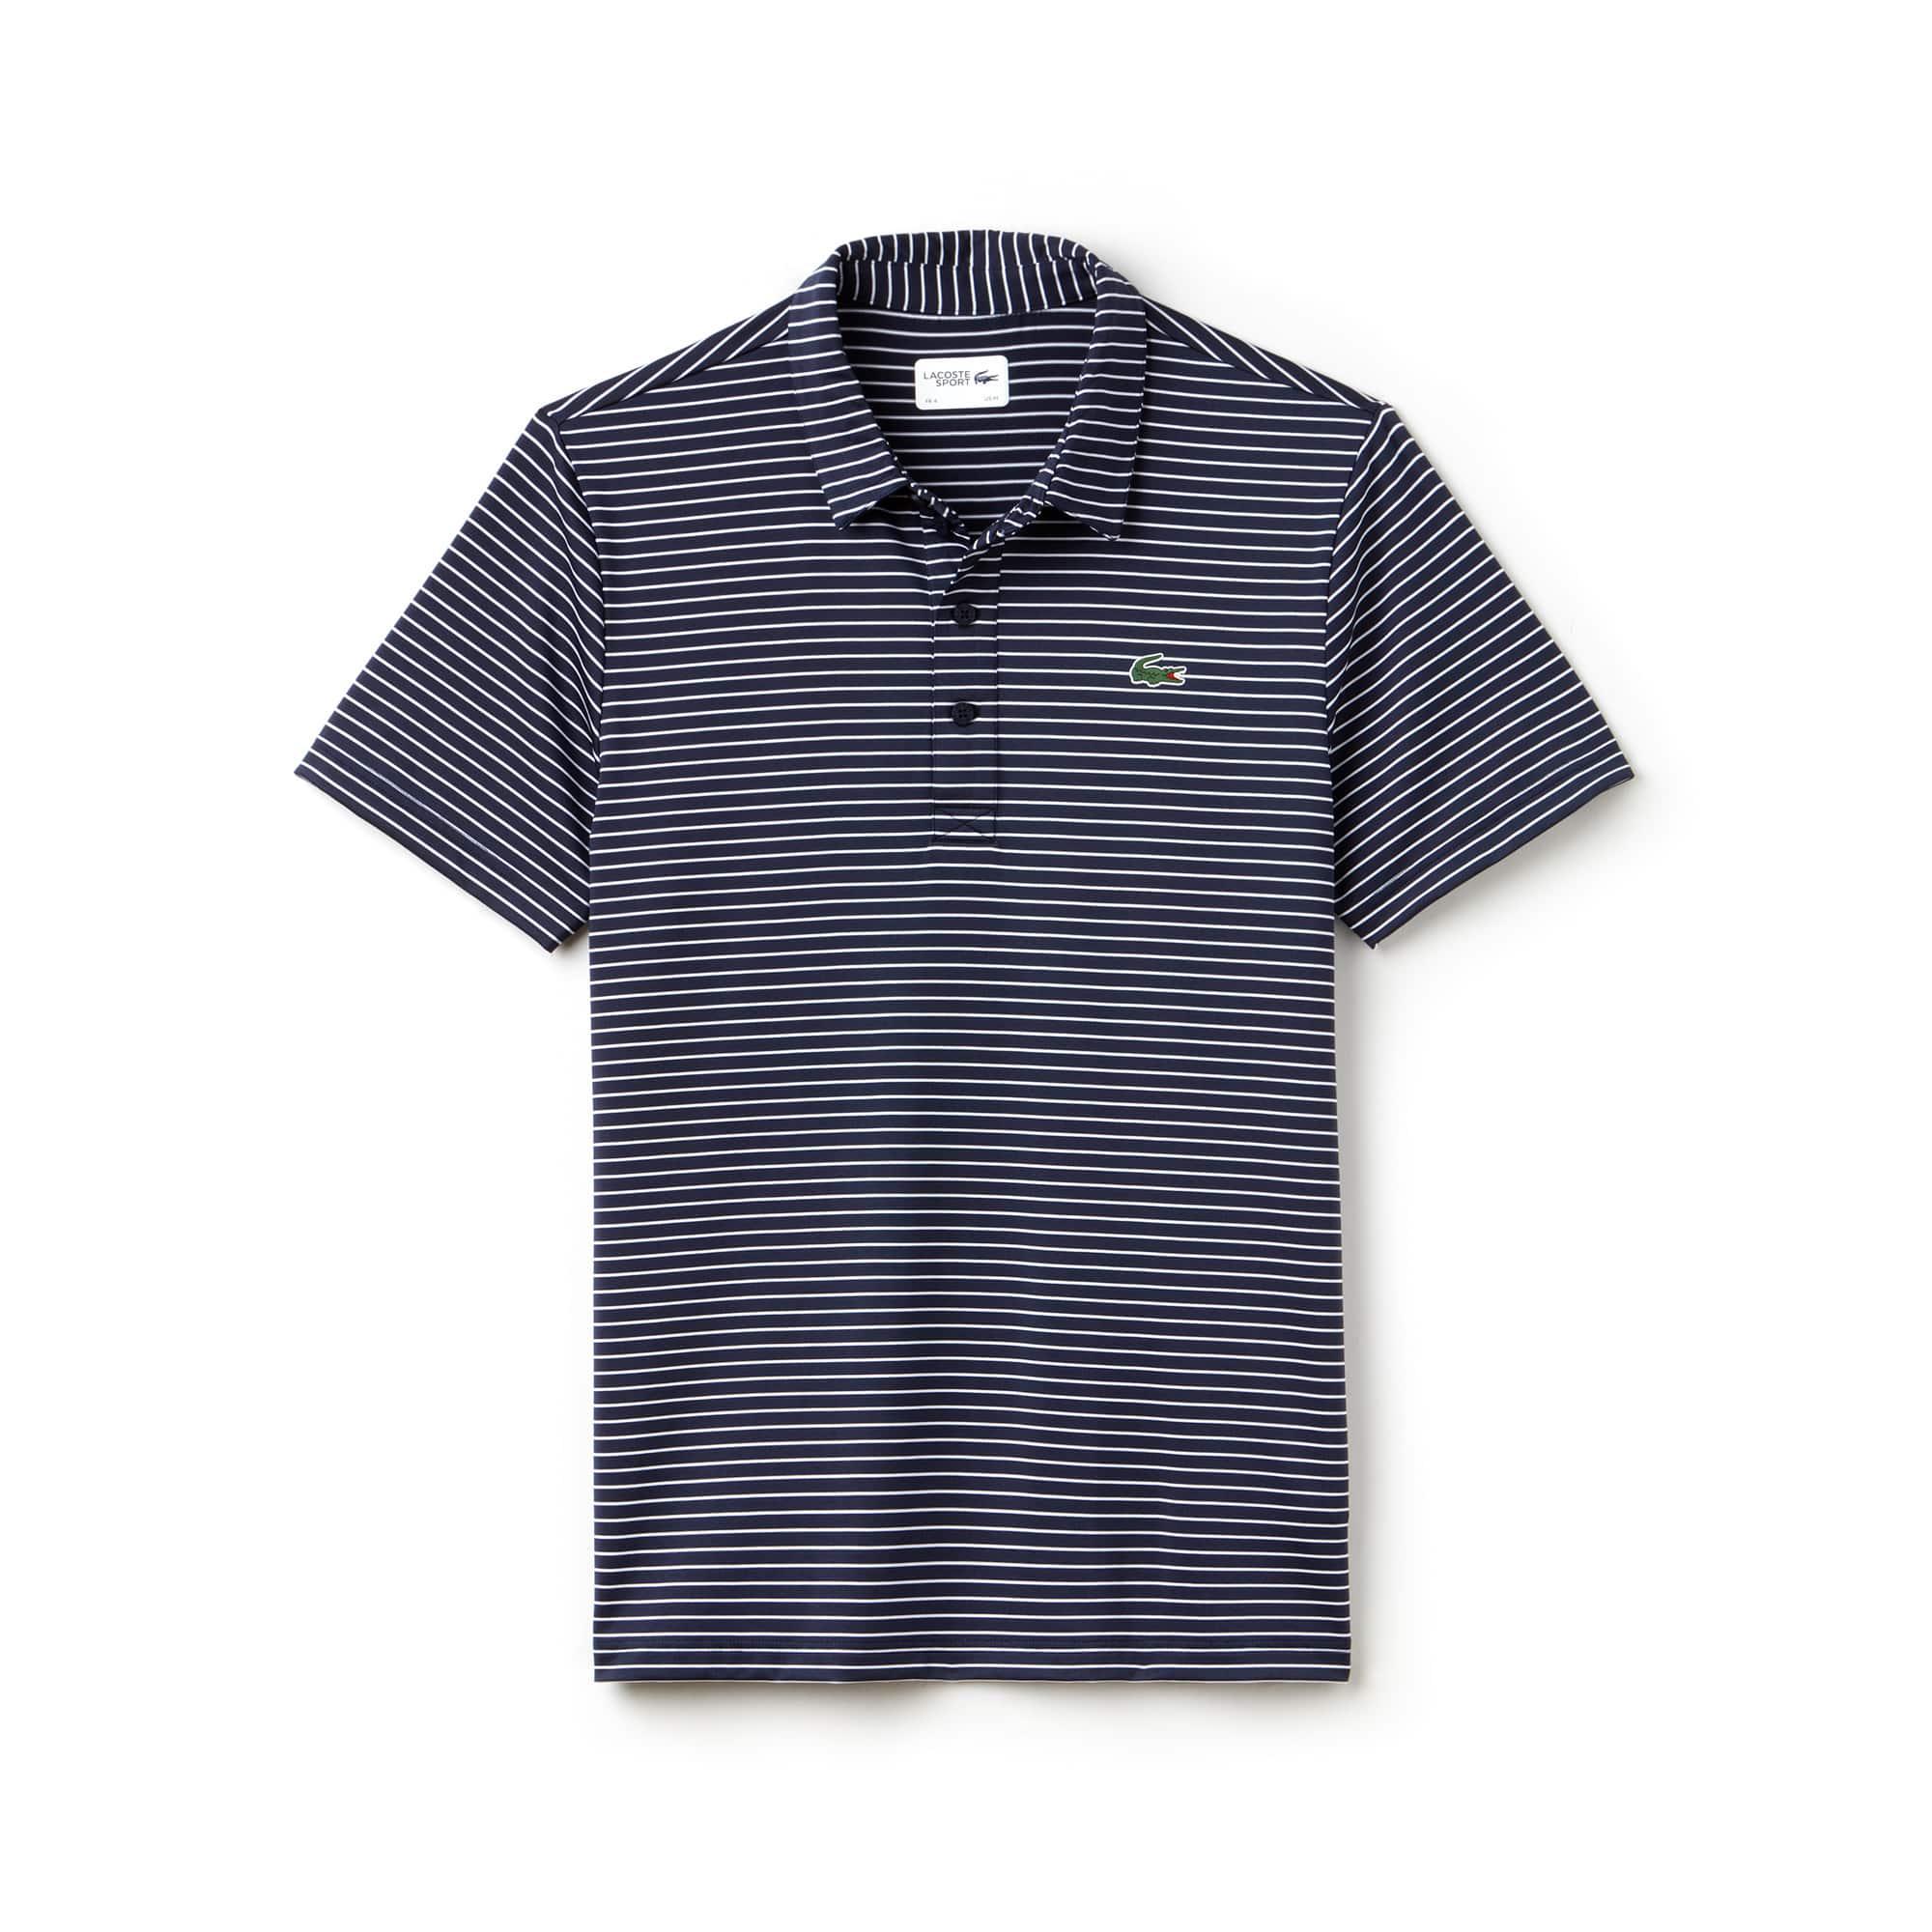 Herren LACOSTE SPORT gestreiftes Golf-Poloshirt